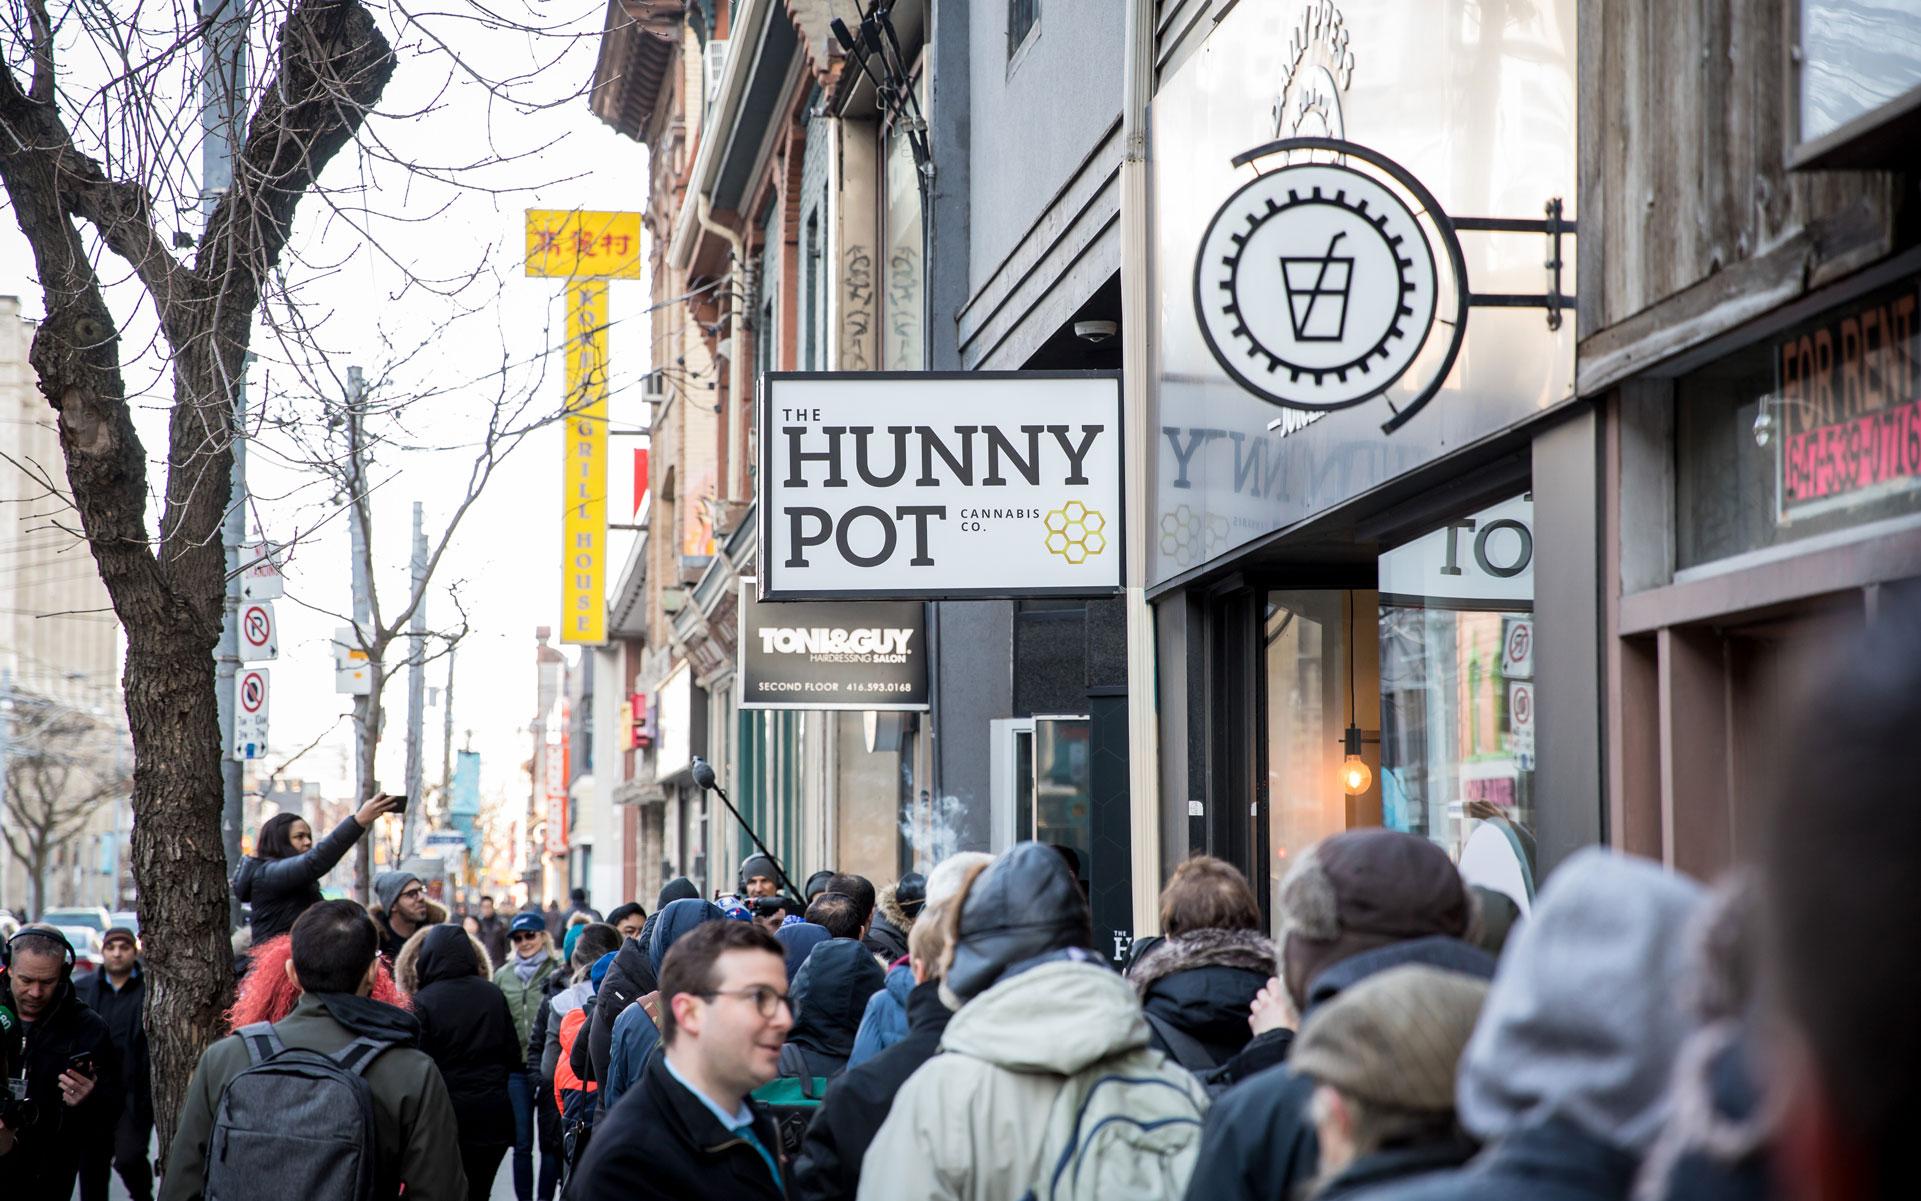 The Hunny Pot cannabis store